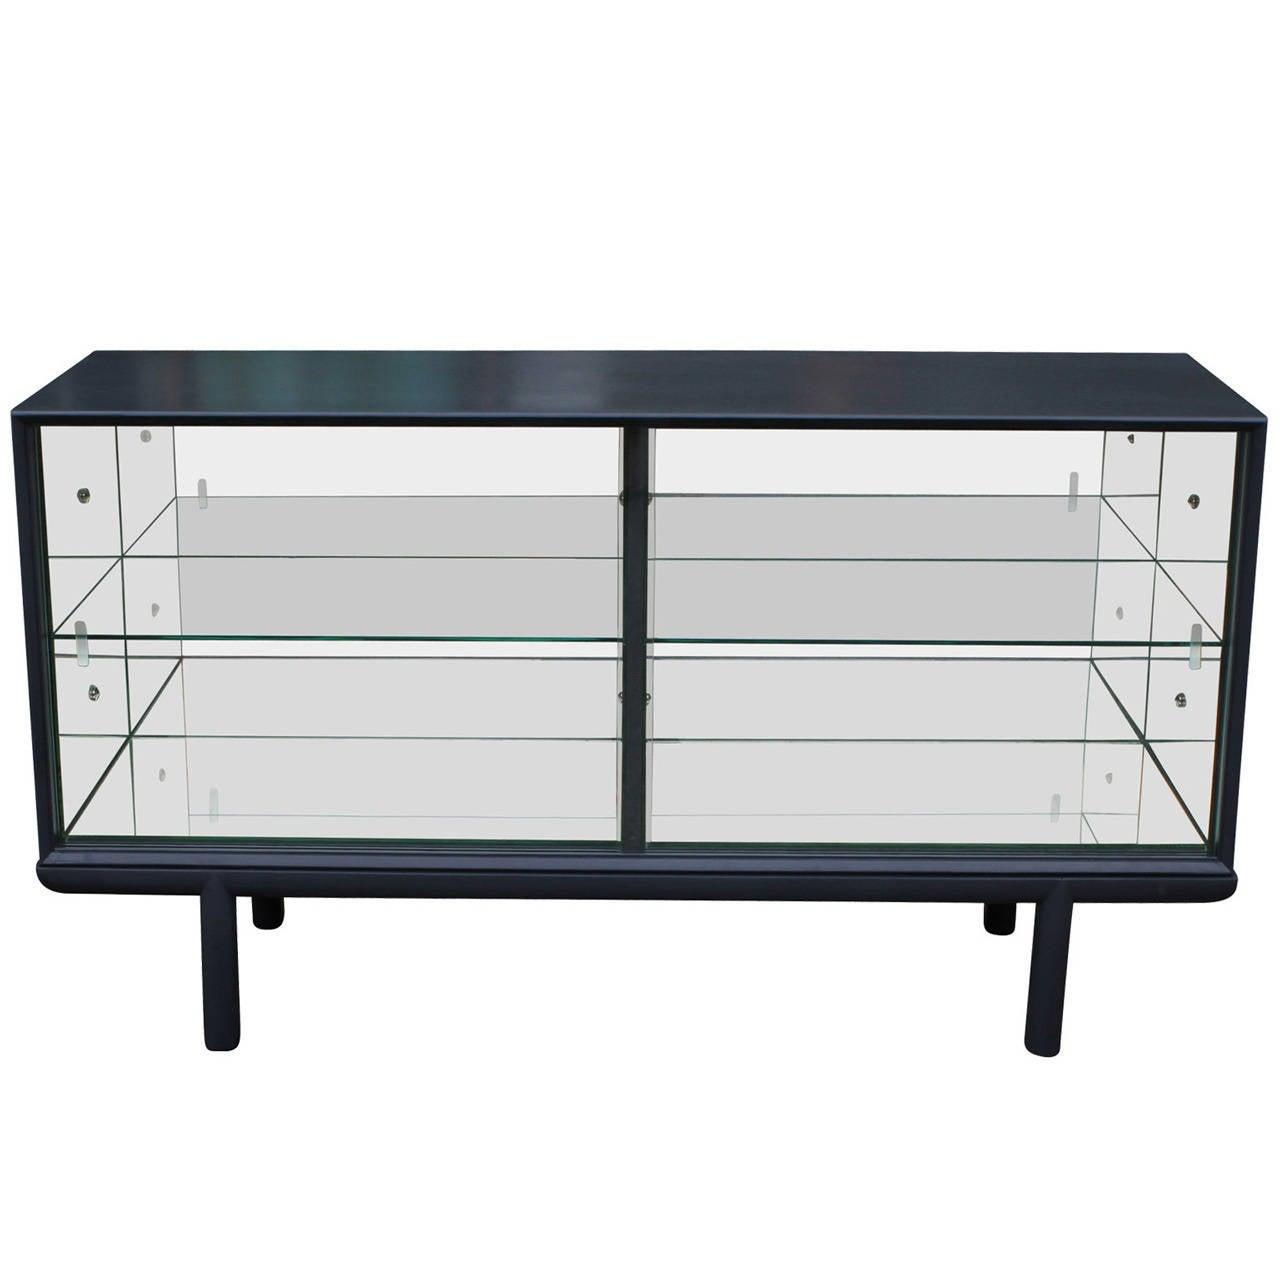 Sliding Glass Doors Buffet ~ Sleek grey mirrored sideboard or display cabinet with